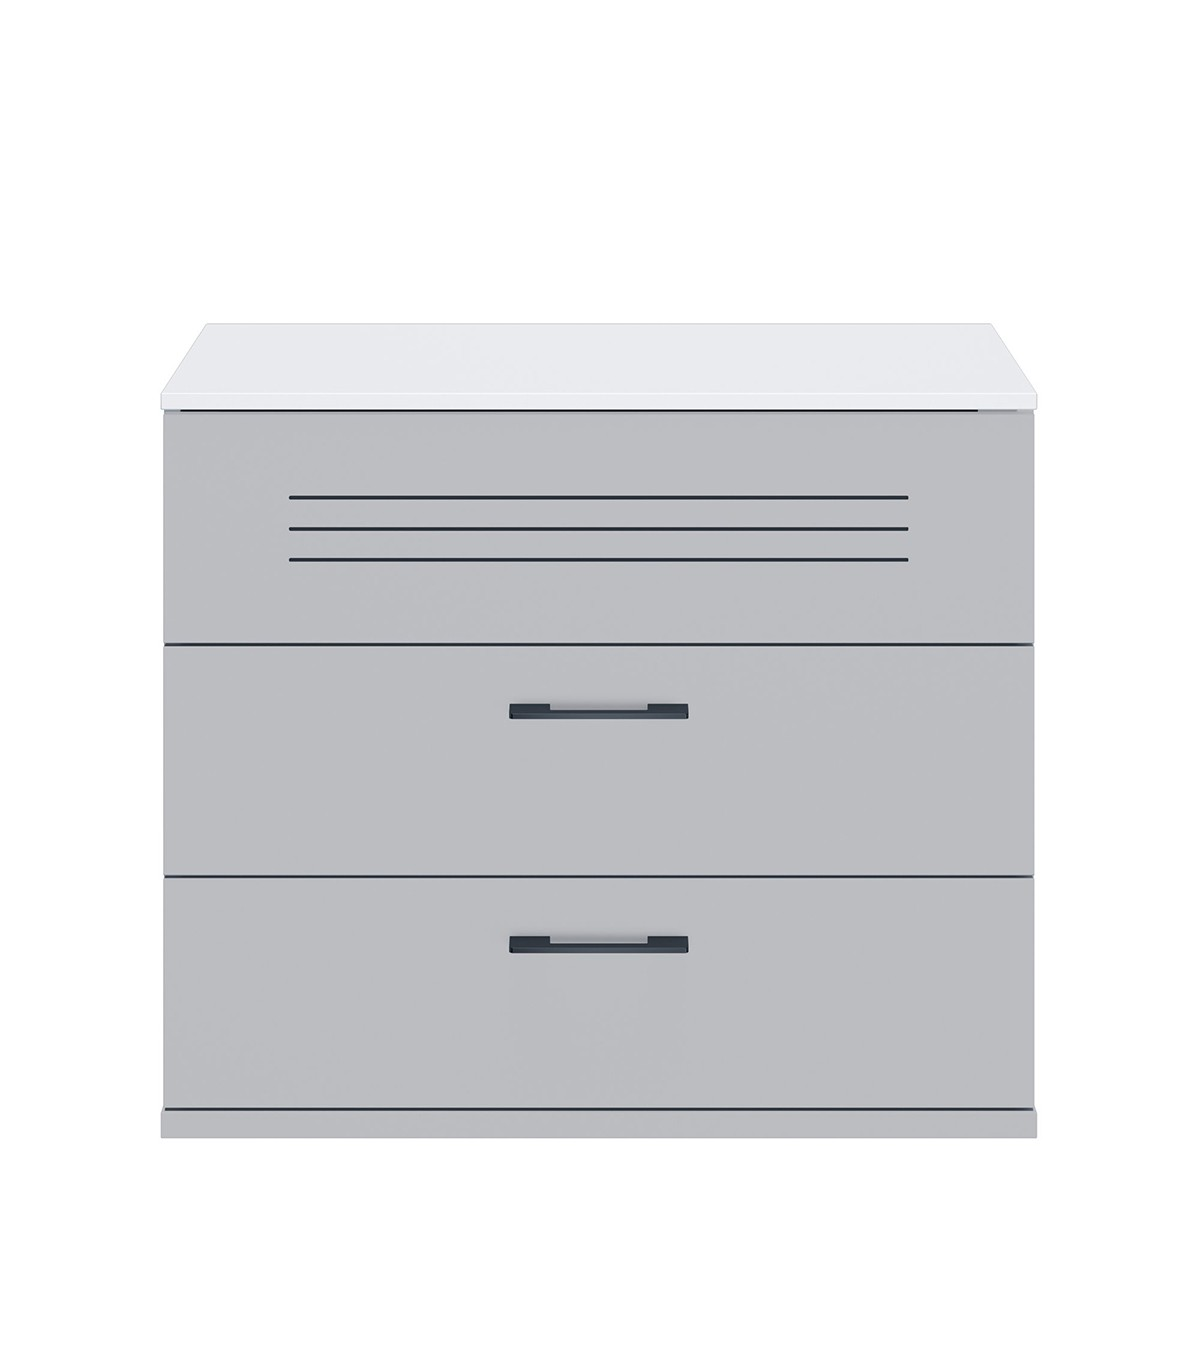 Commode 3 tiroirs blanche Enfant - 85 x H73 cm